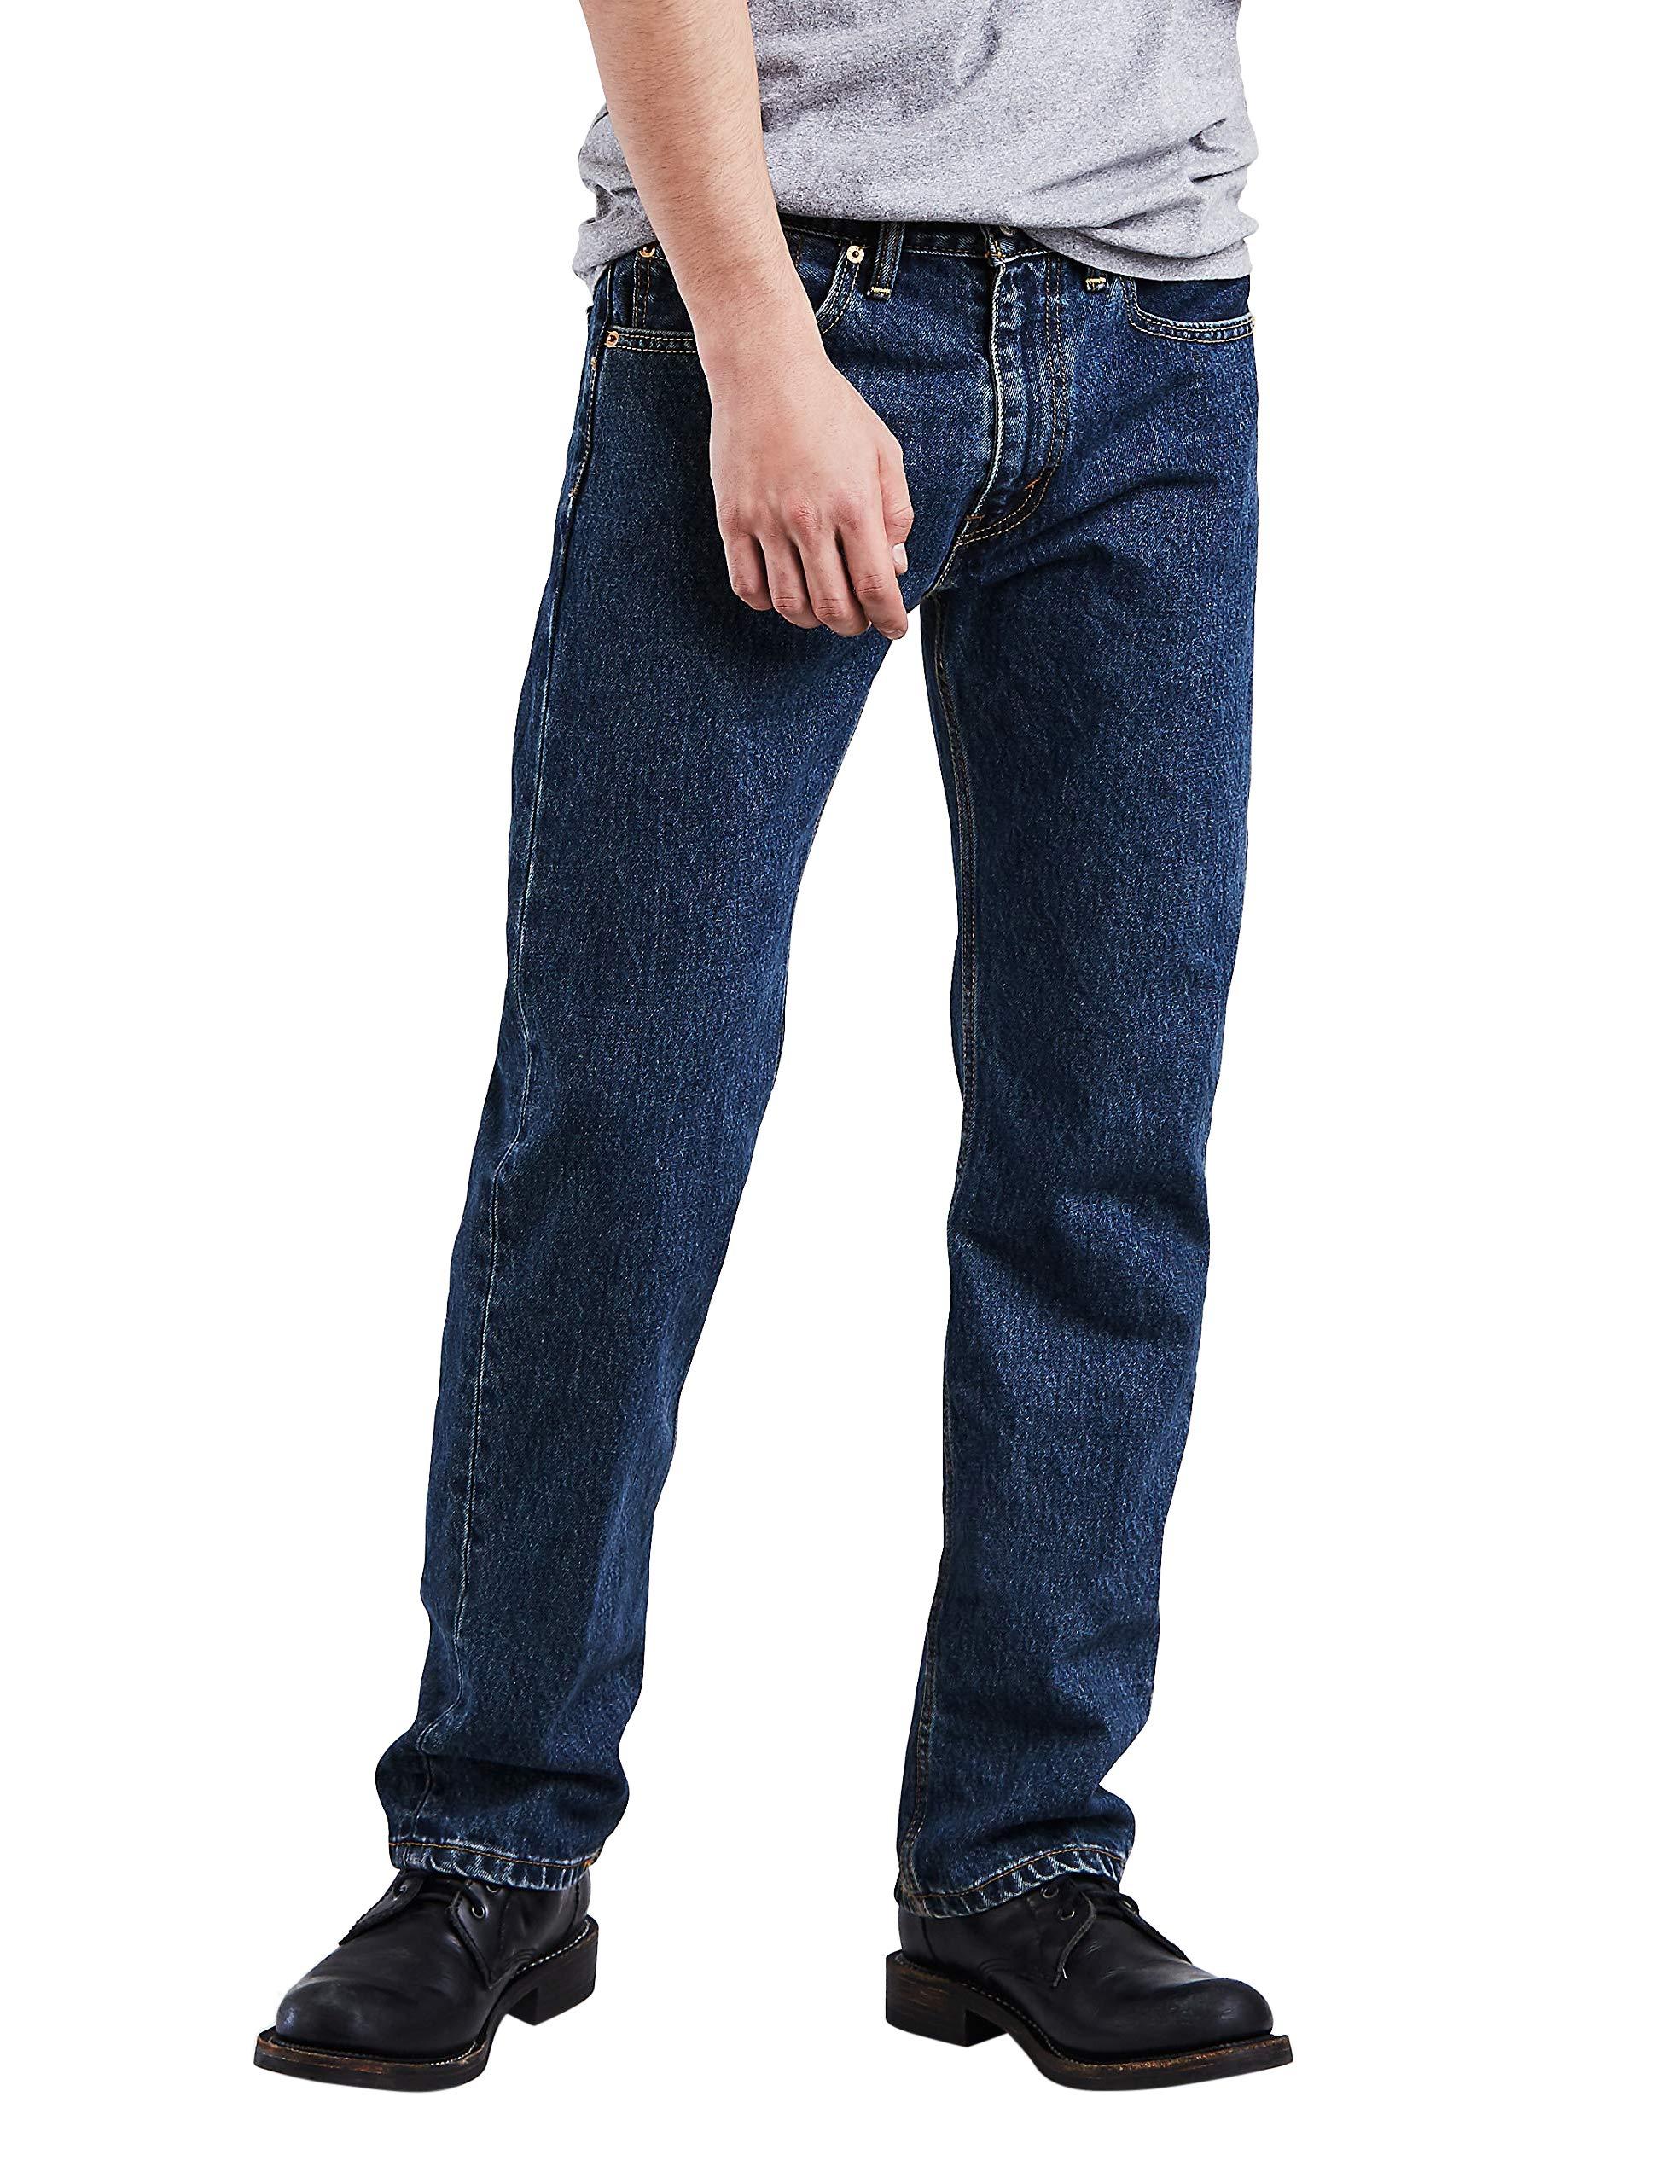 Levi's Men's 505 Regular Fit Jean, Dark Stonewash 38x32